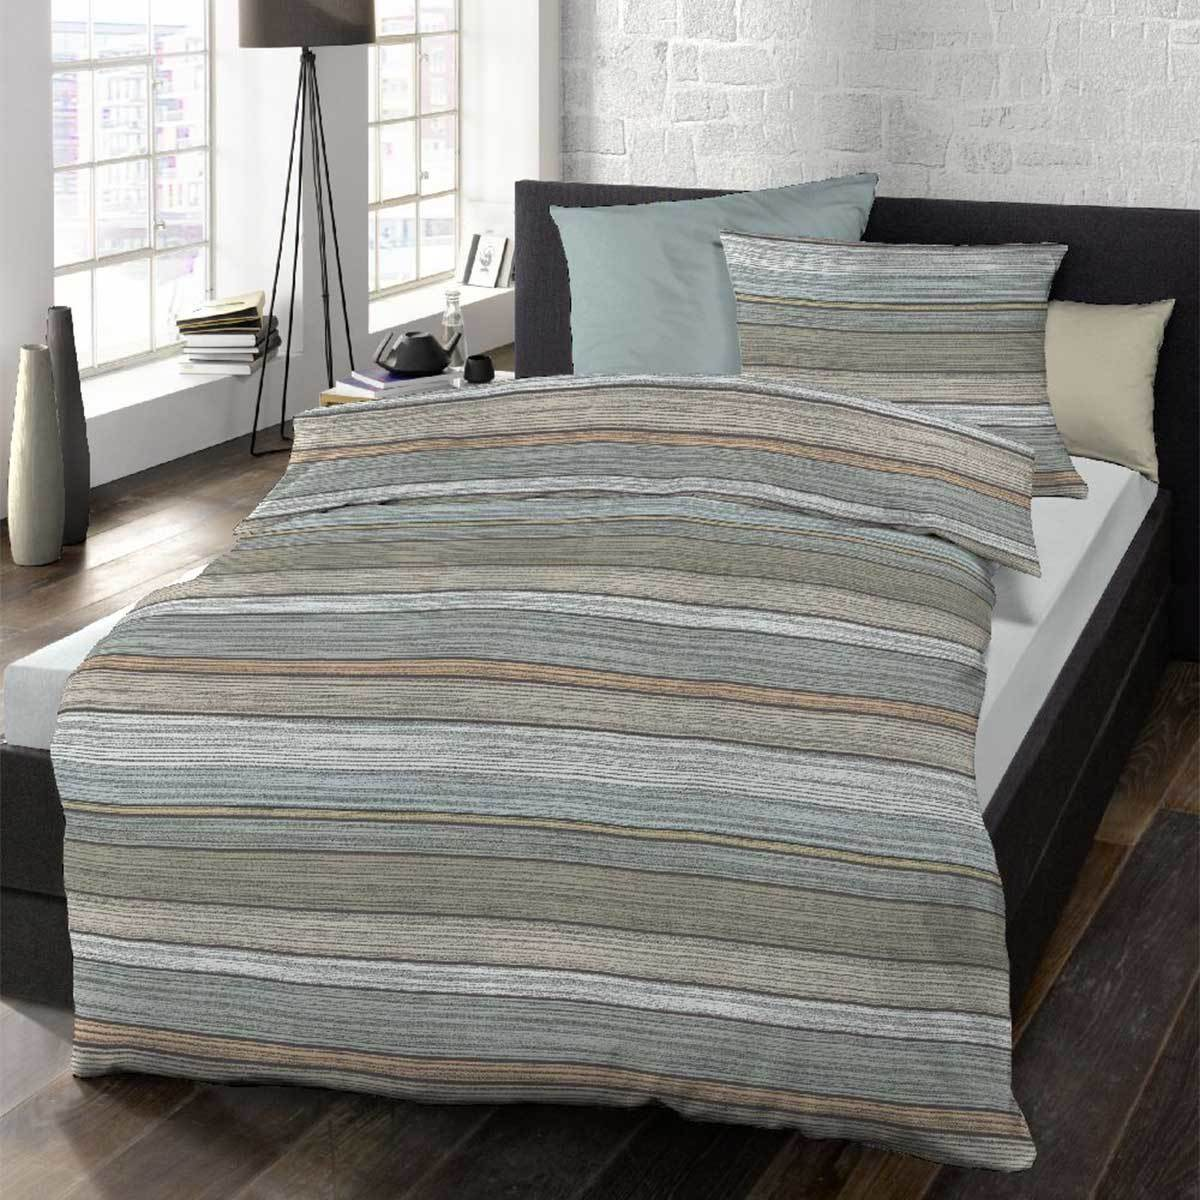 schlafgut soft touch cotton bettw sche marcello bermuda. Black Bedroom Furniture Sets. Home Design Ideas